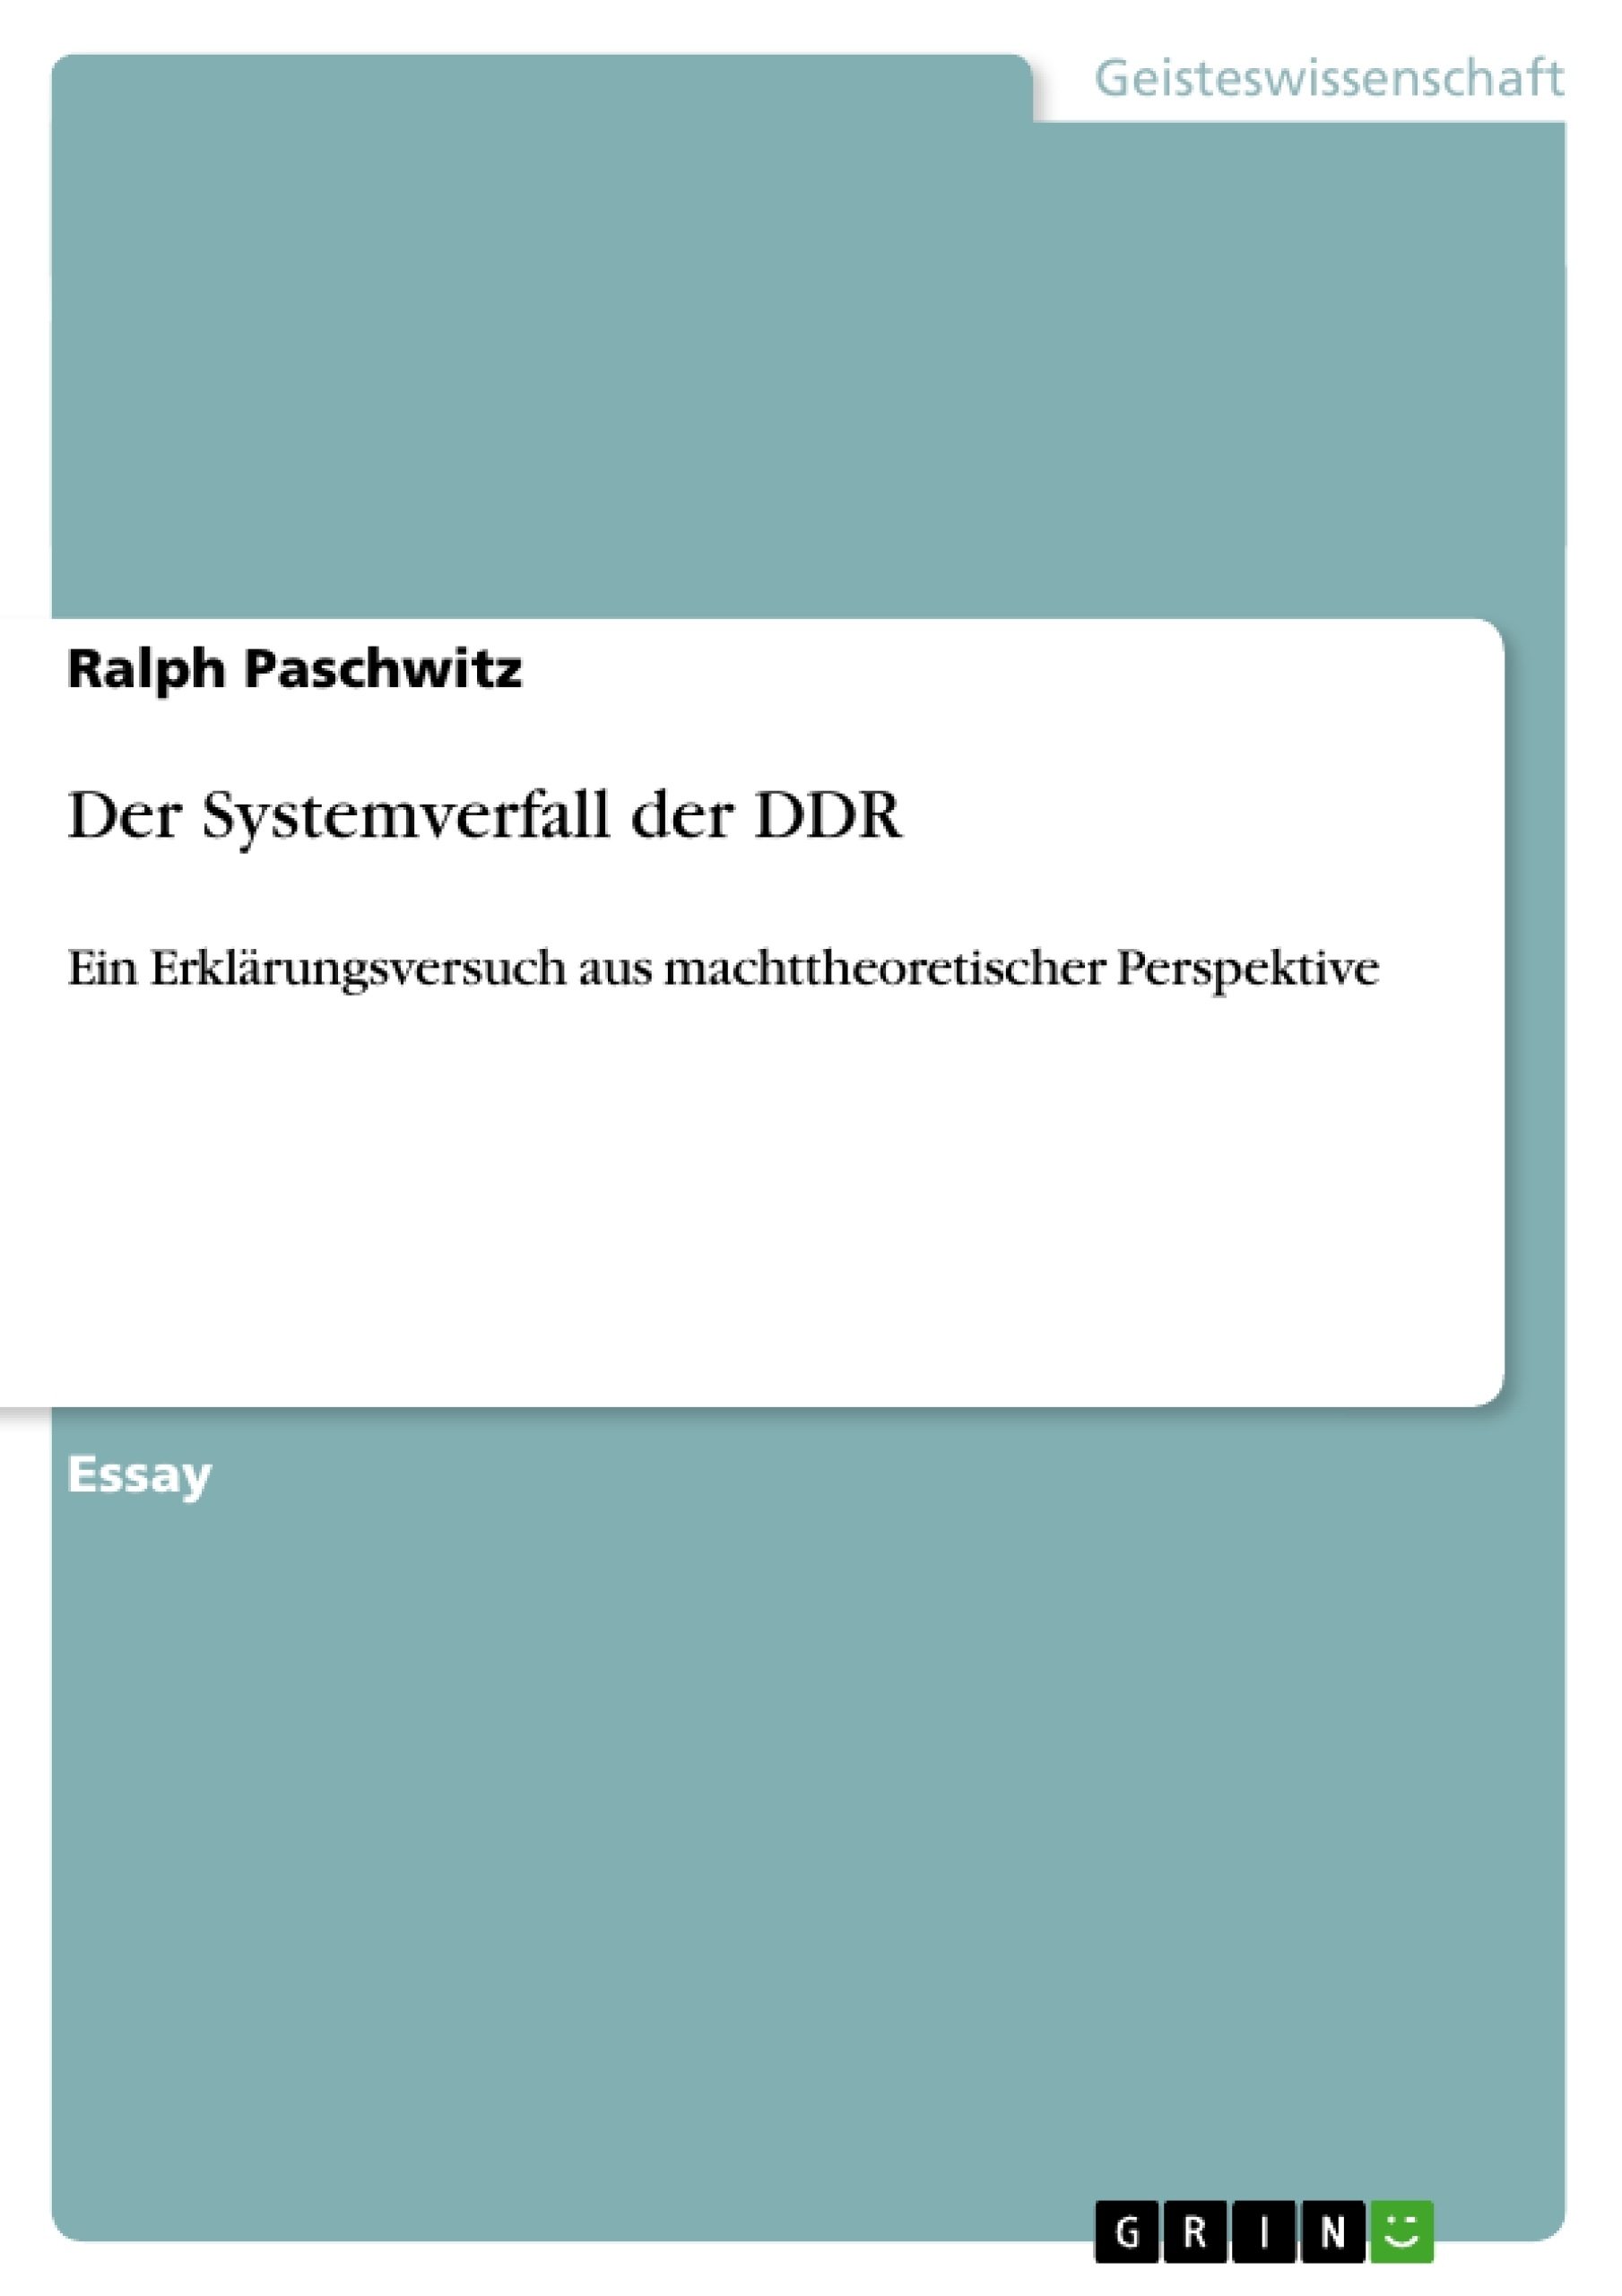 Titel: Der Systemverfall der DDR